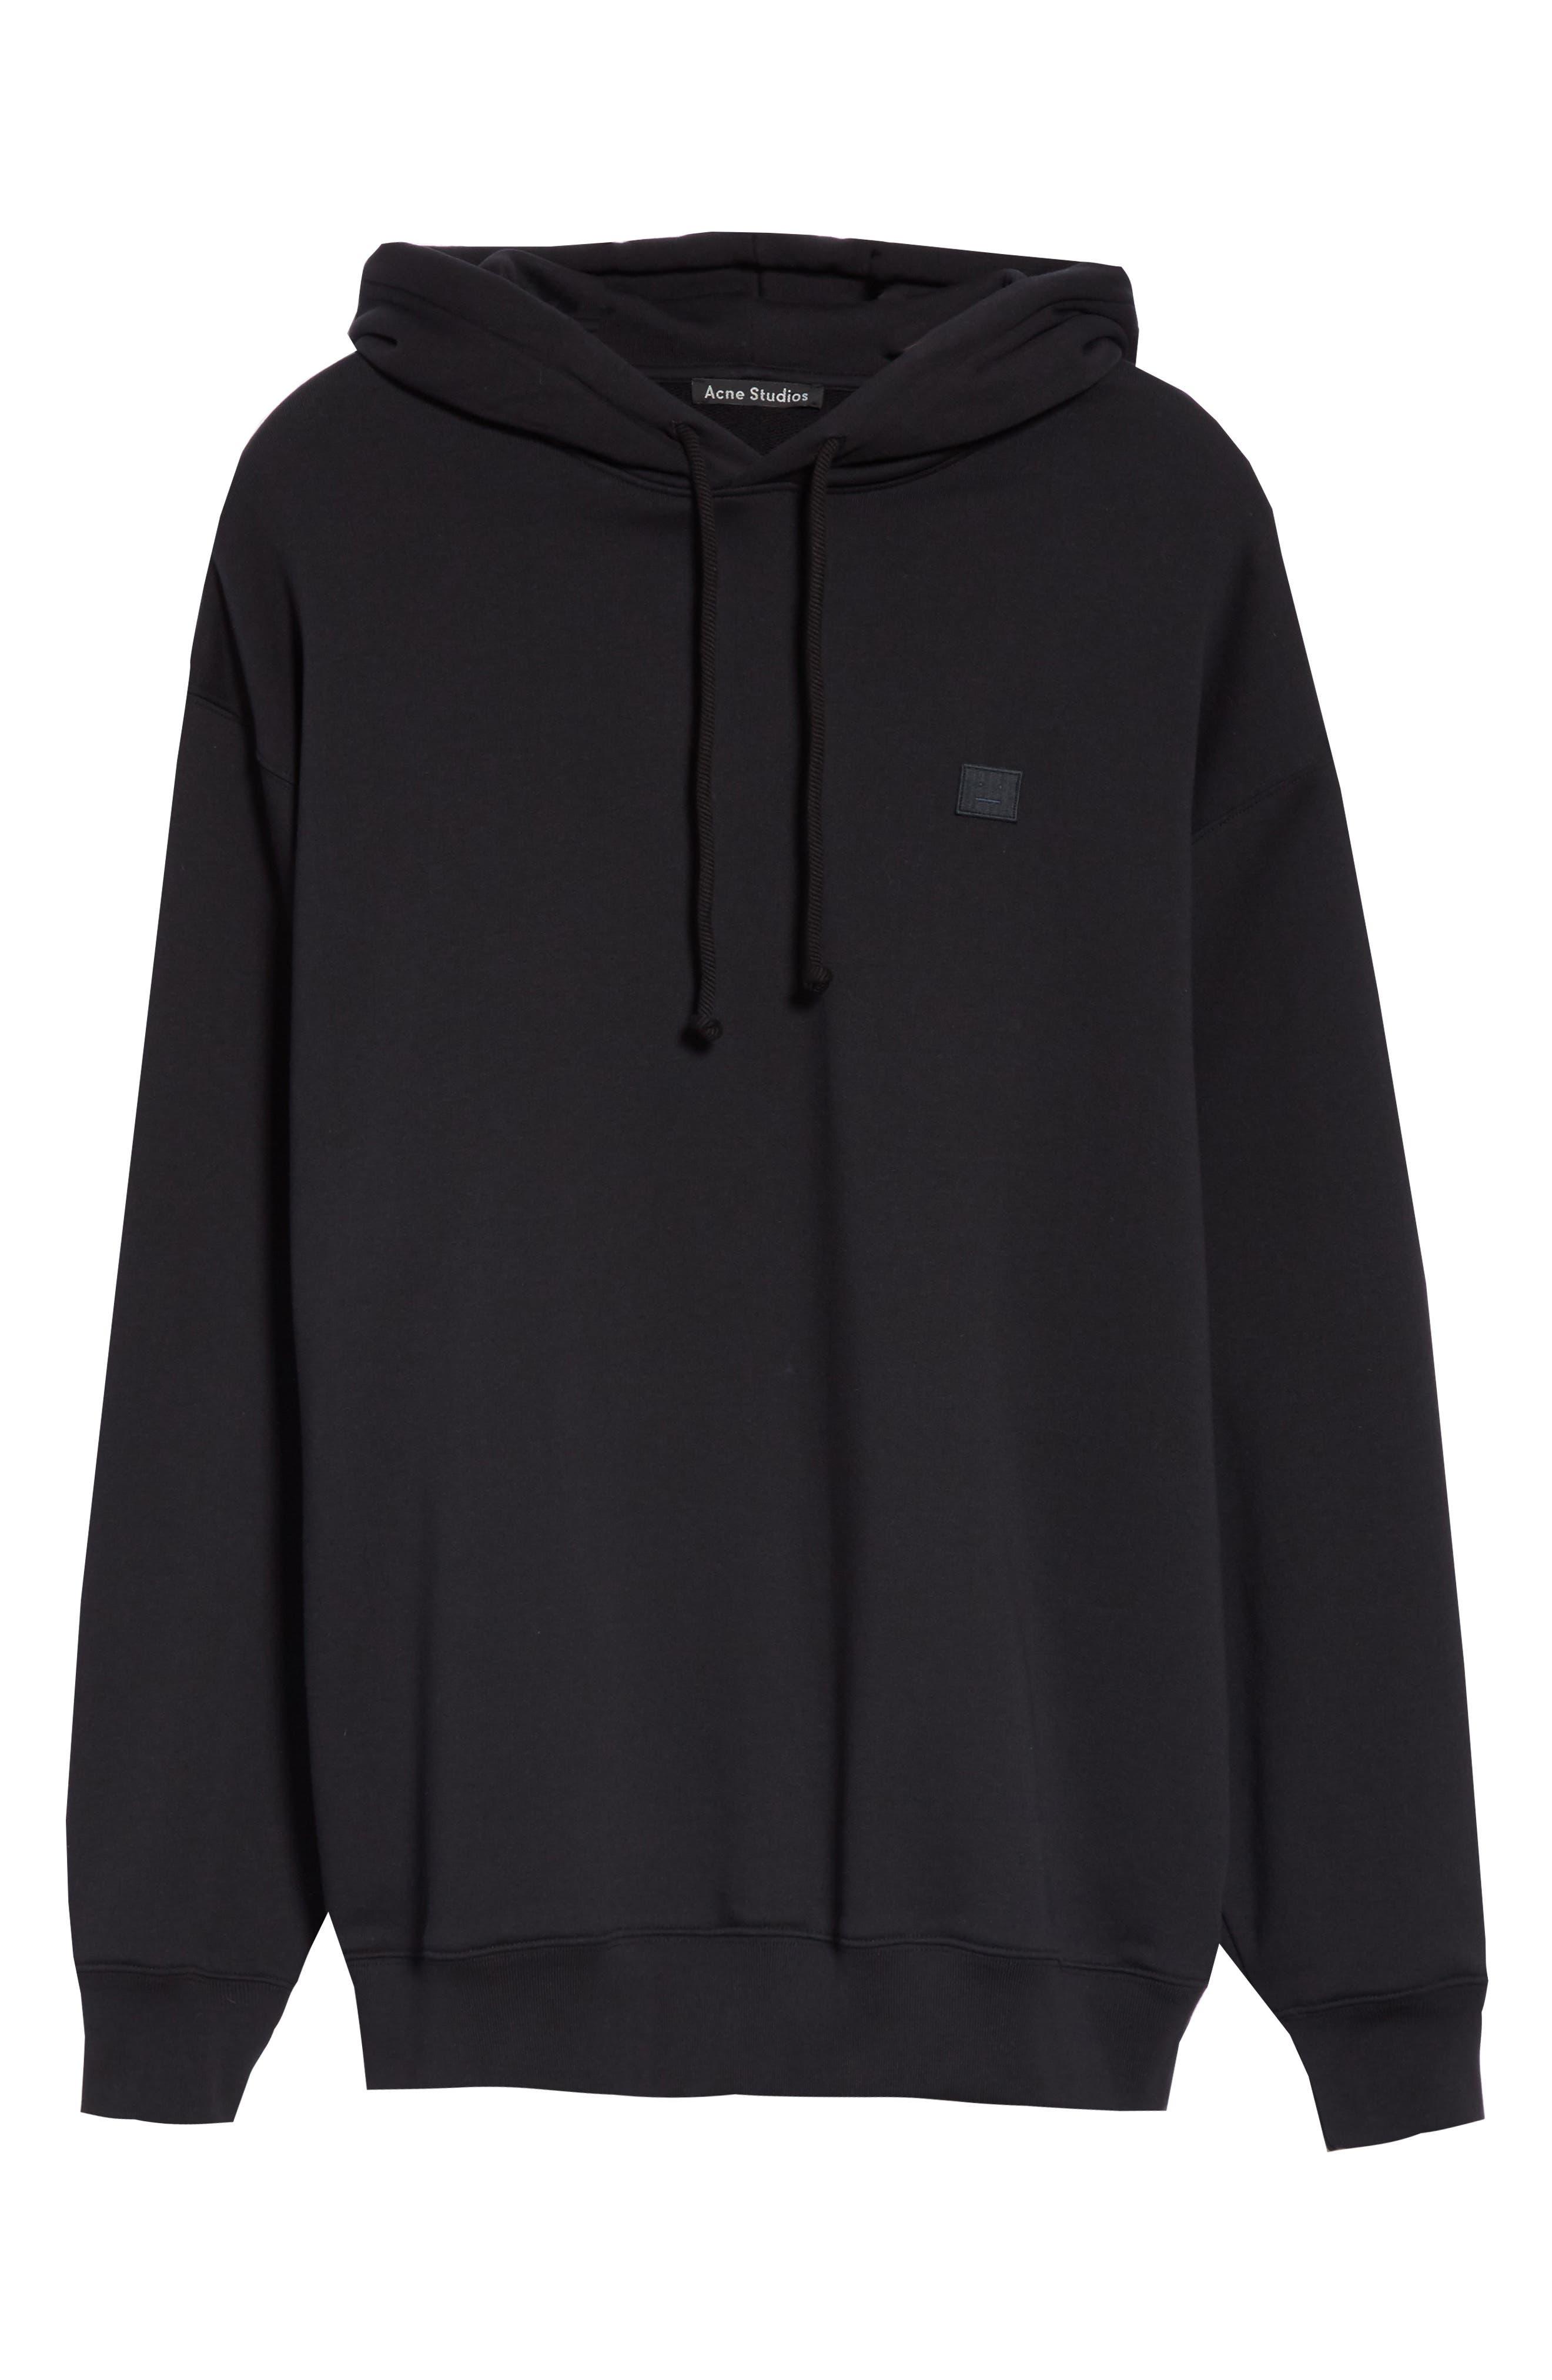 ACNE STUDIOS, Farrin Face Hooded Sweatshirt, Alternate thumbnail 6, color, BLACK